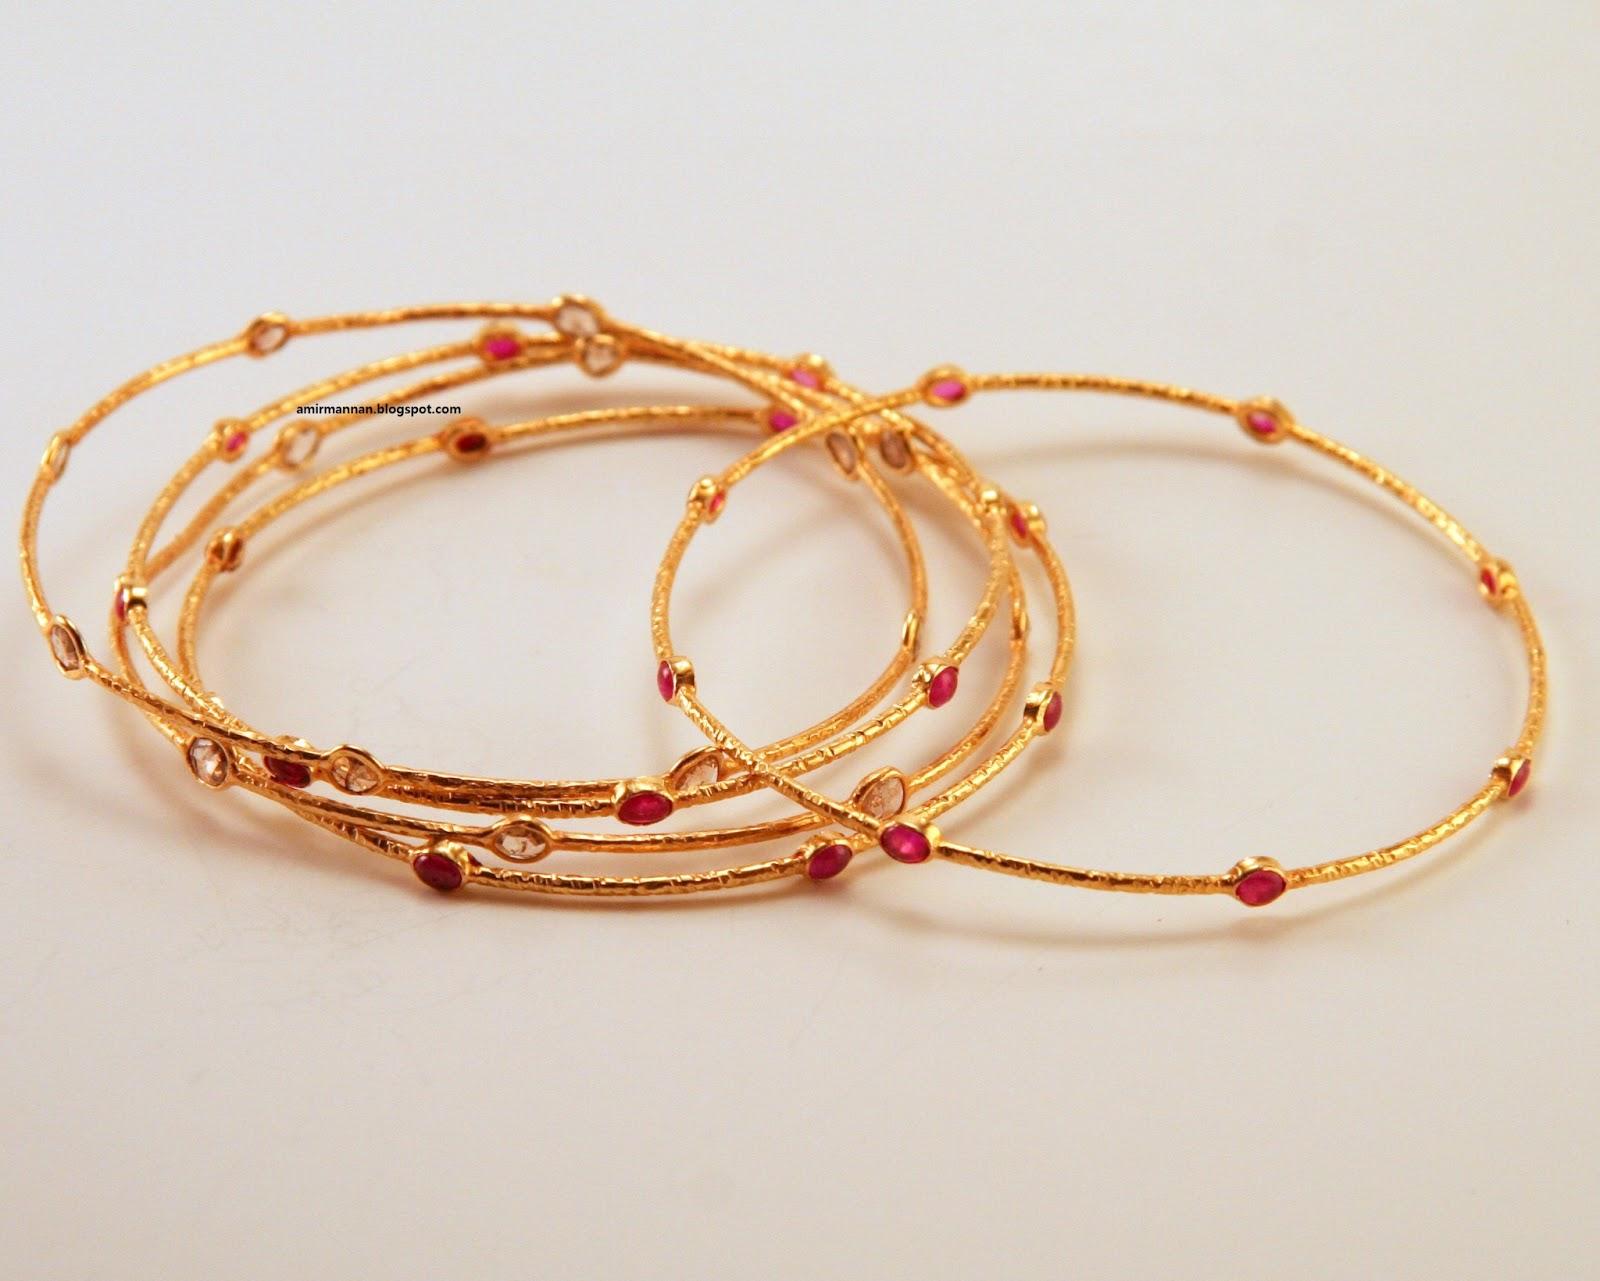 Bracelets jewellery designs Just another WordPress site